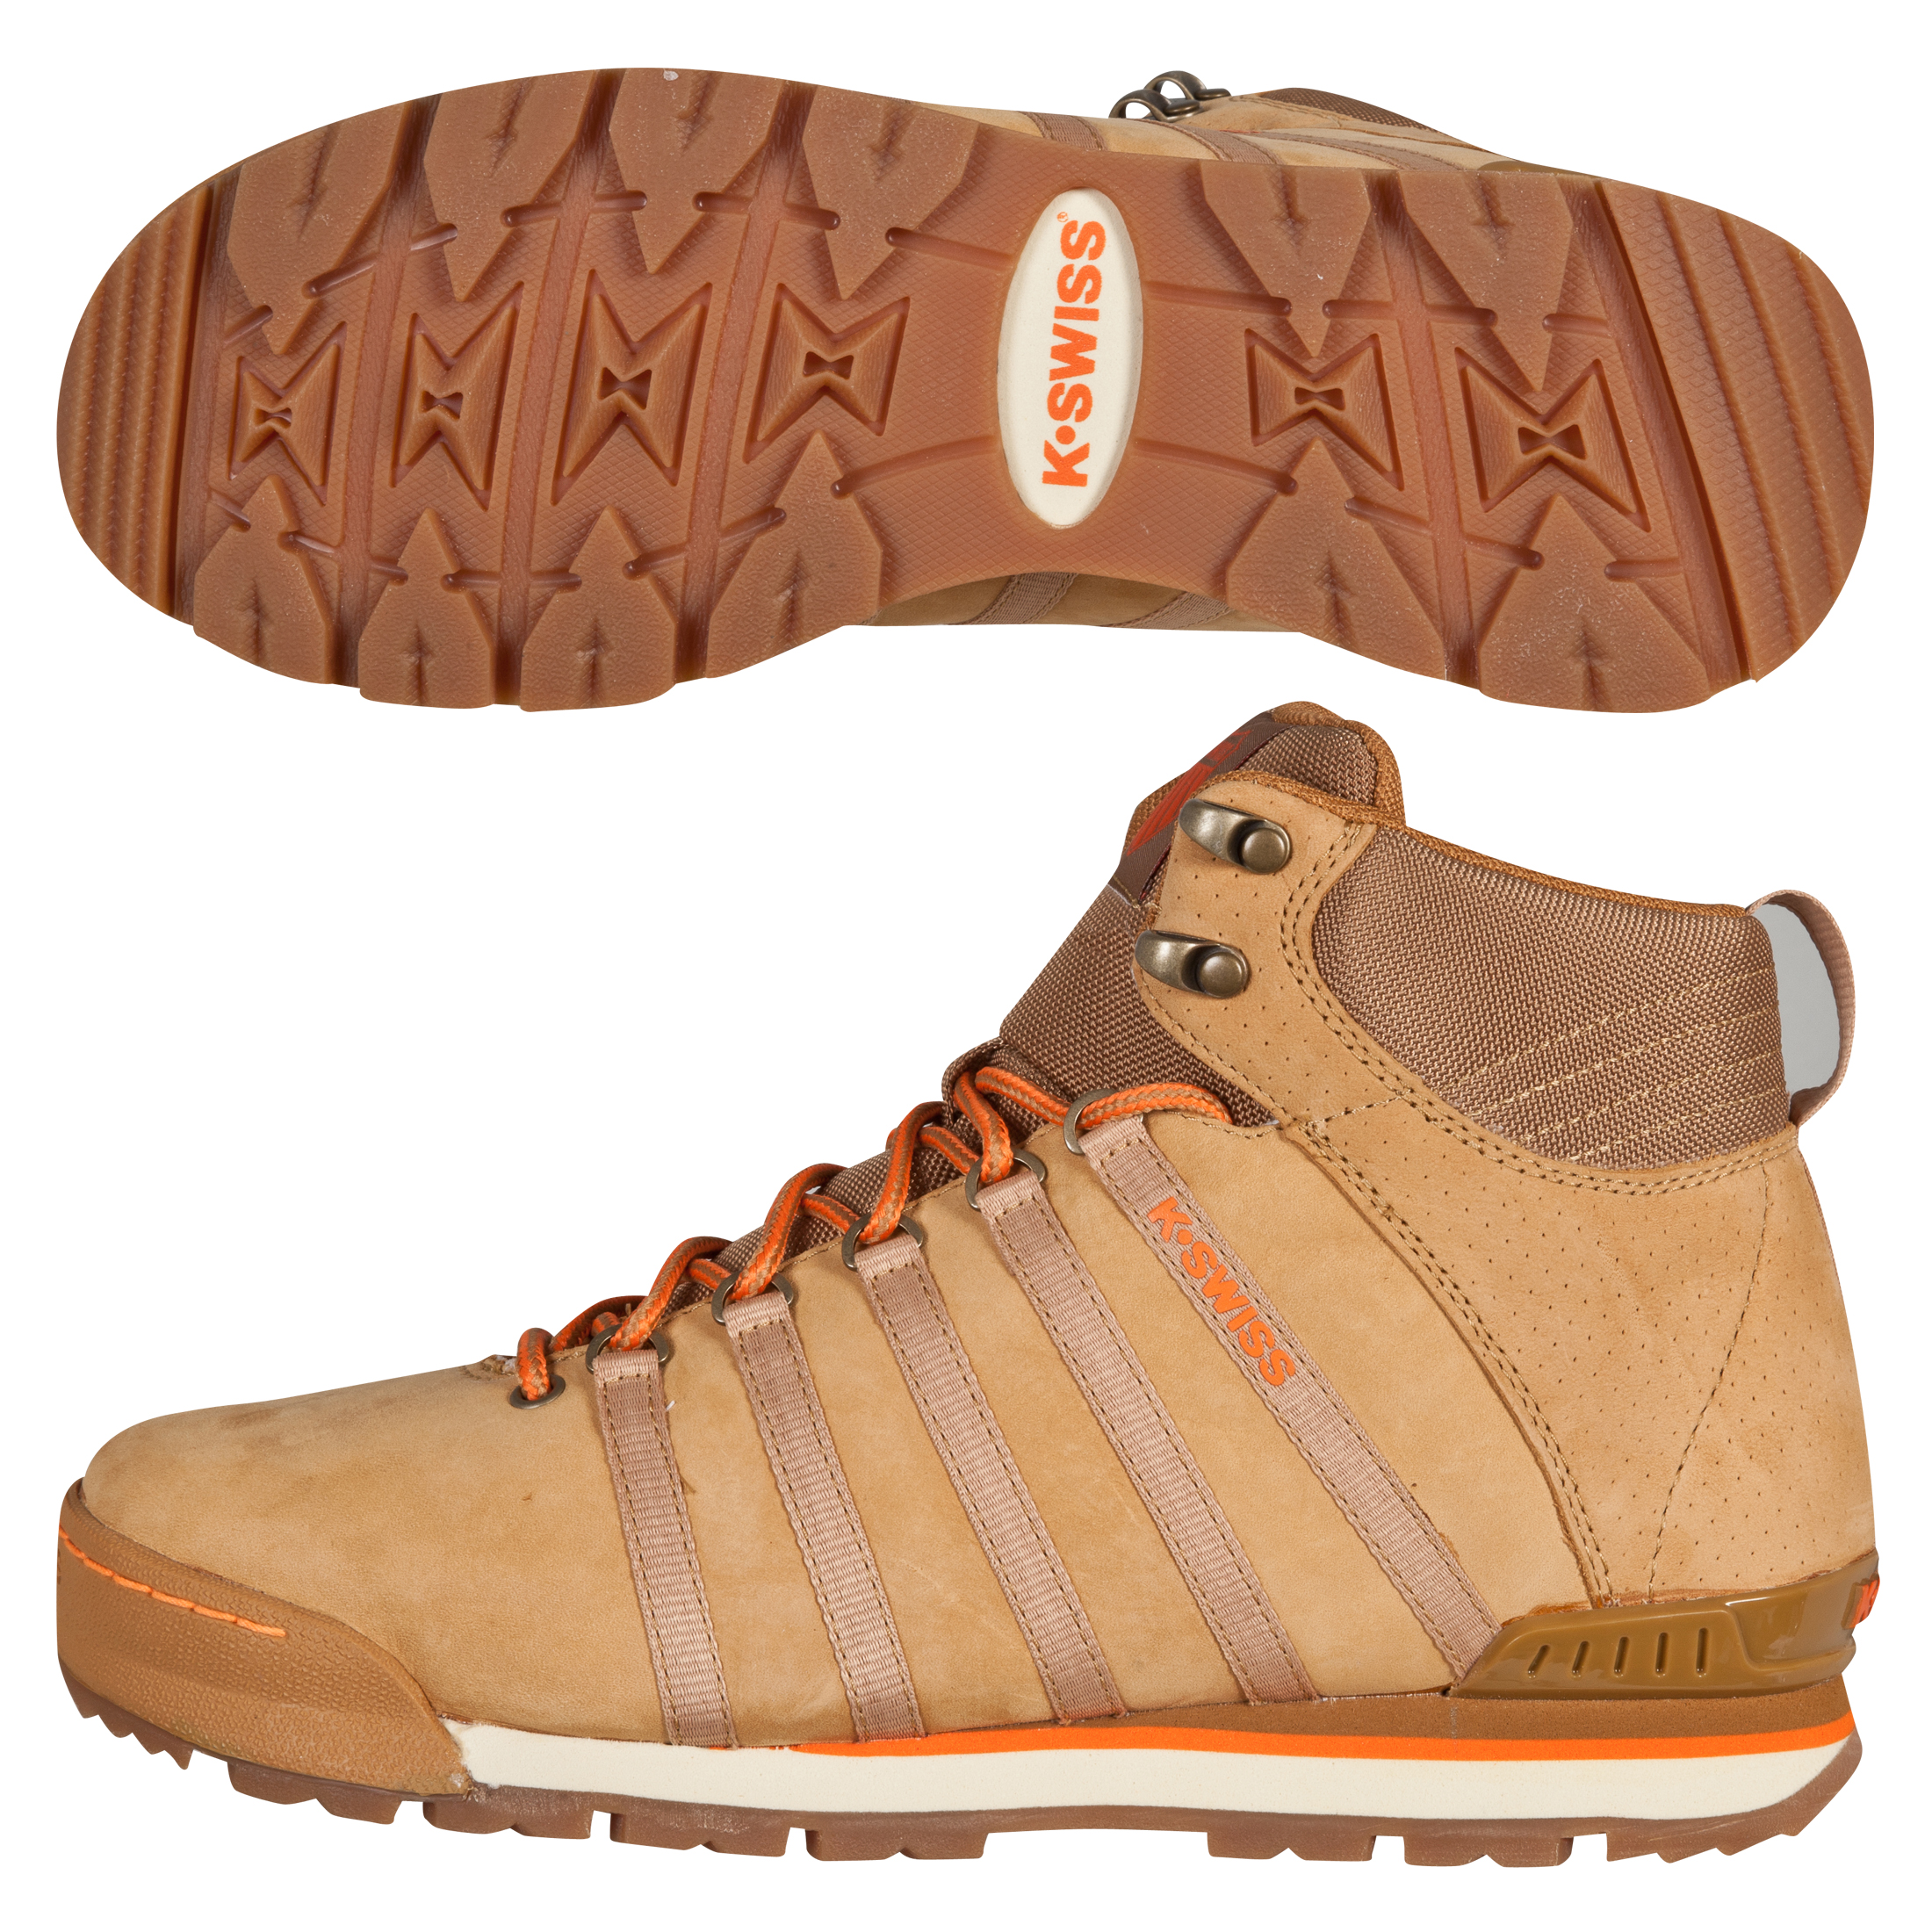 K Swiss K-Swiss Classic Hiker High Boots - Bone Brown/Bisque/Vibrant Orange/Dark Gum